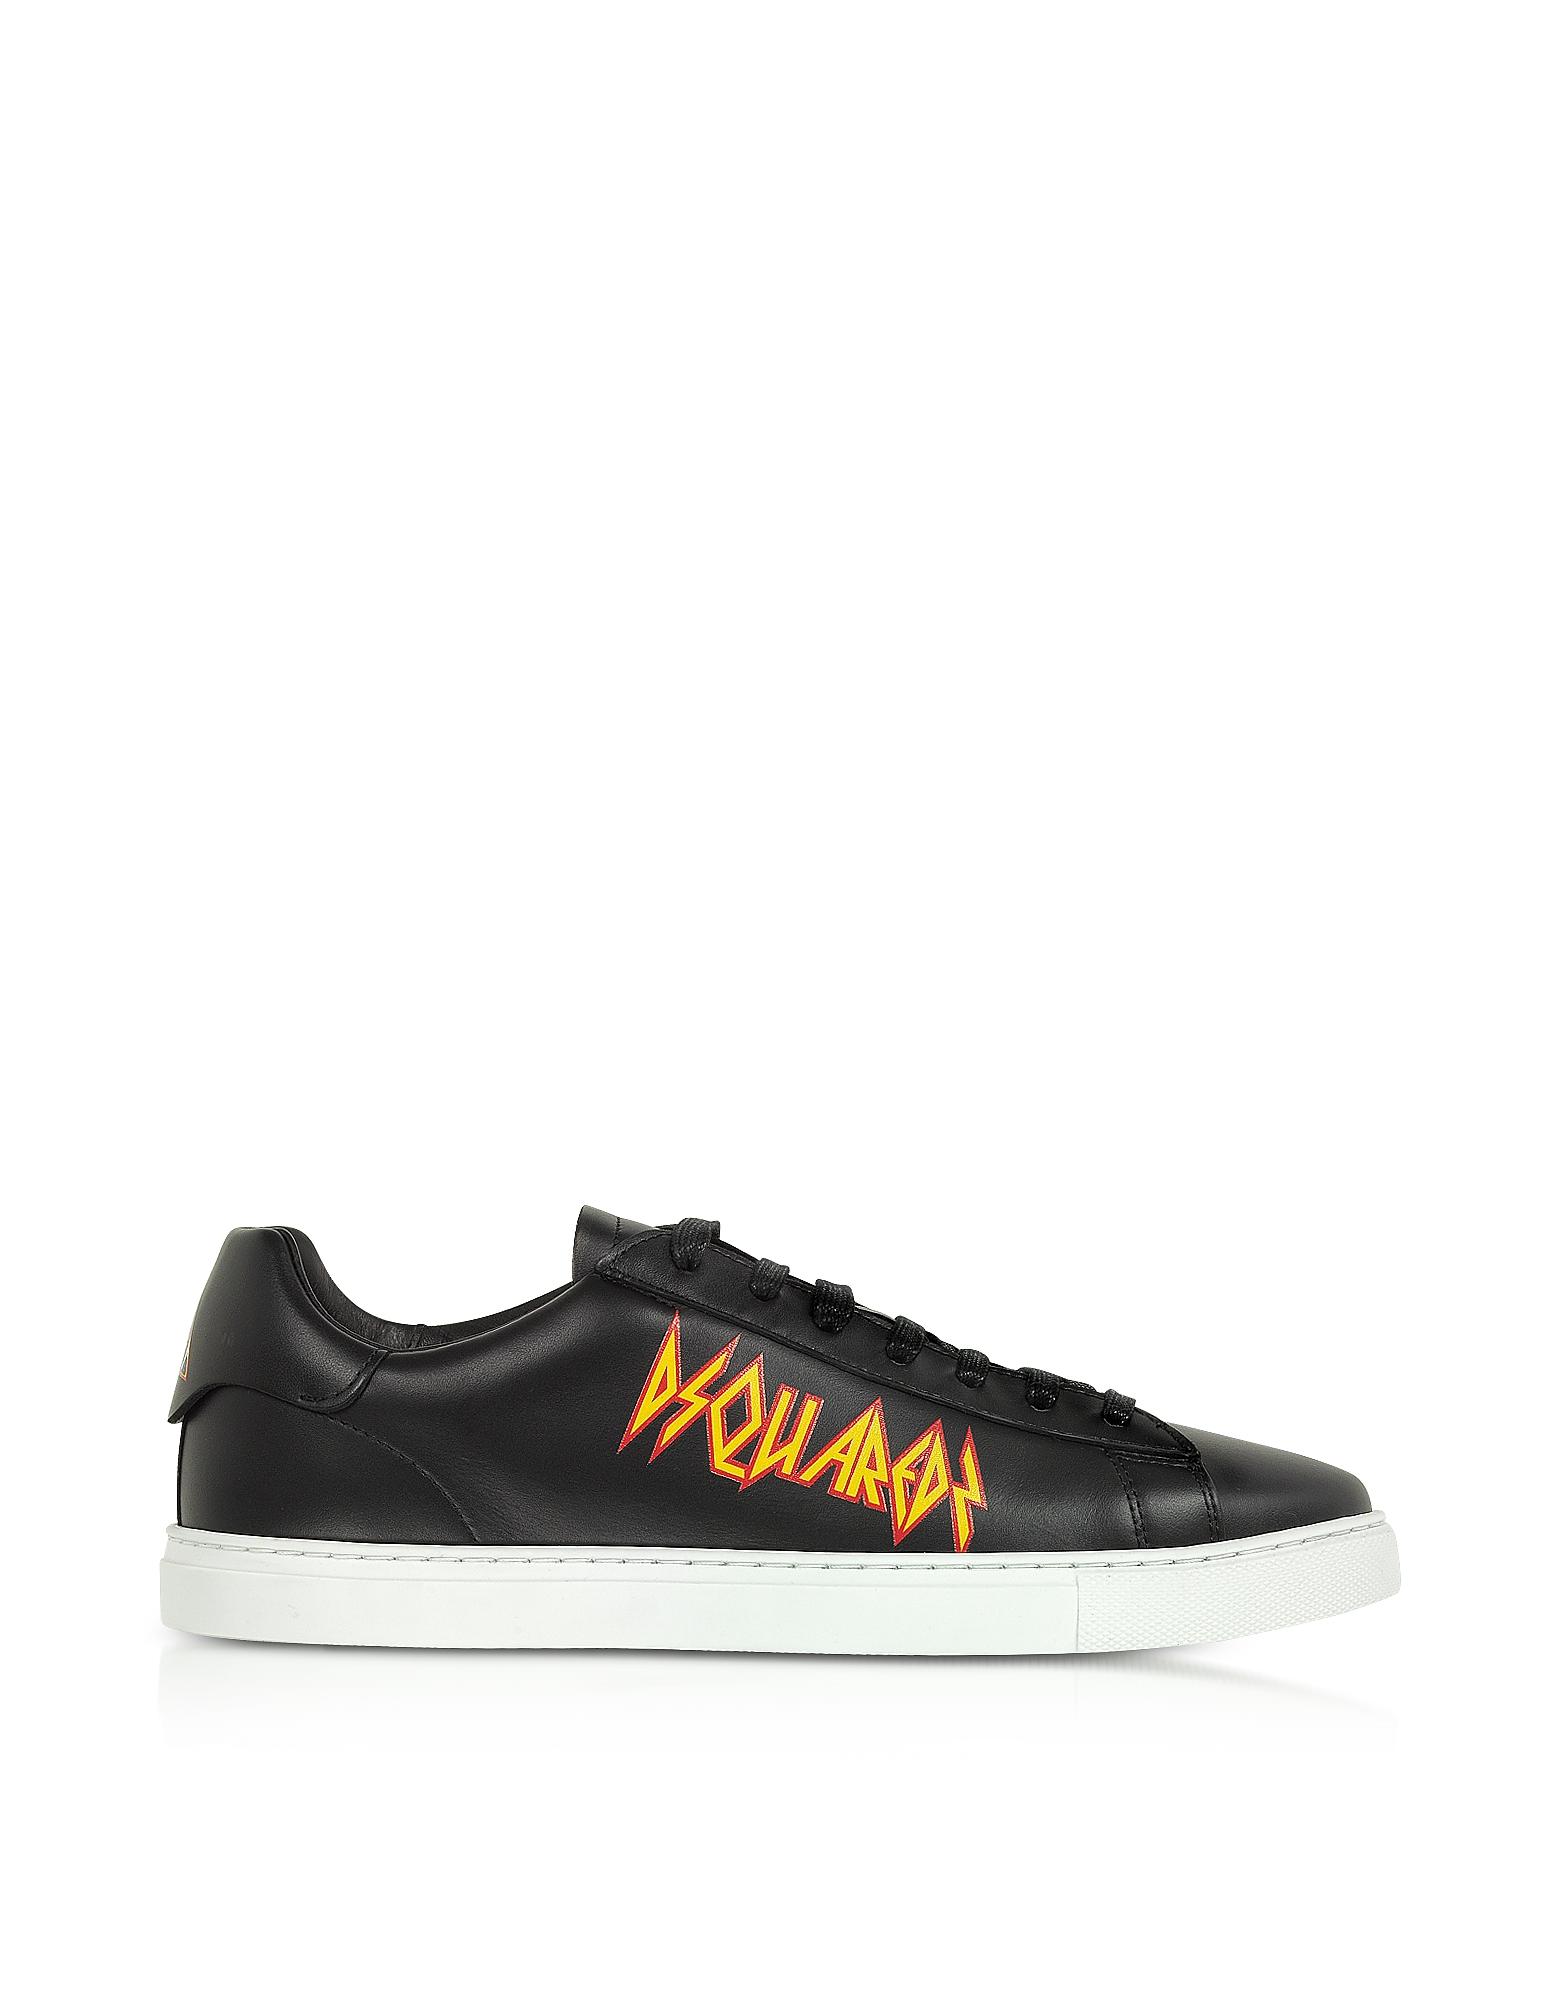 Punk New Tennis Sneakers w/ Rock Print